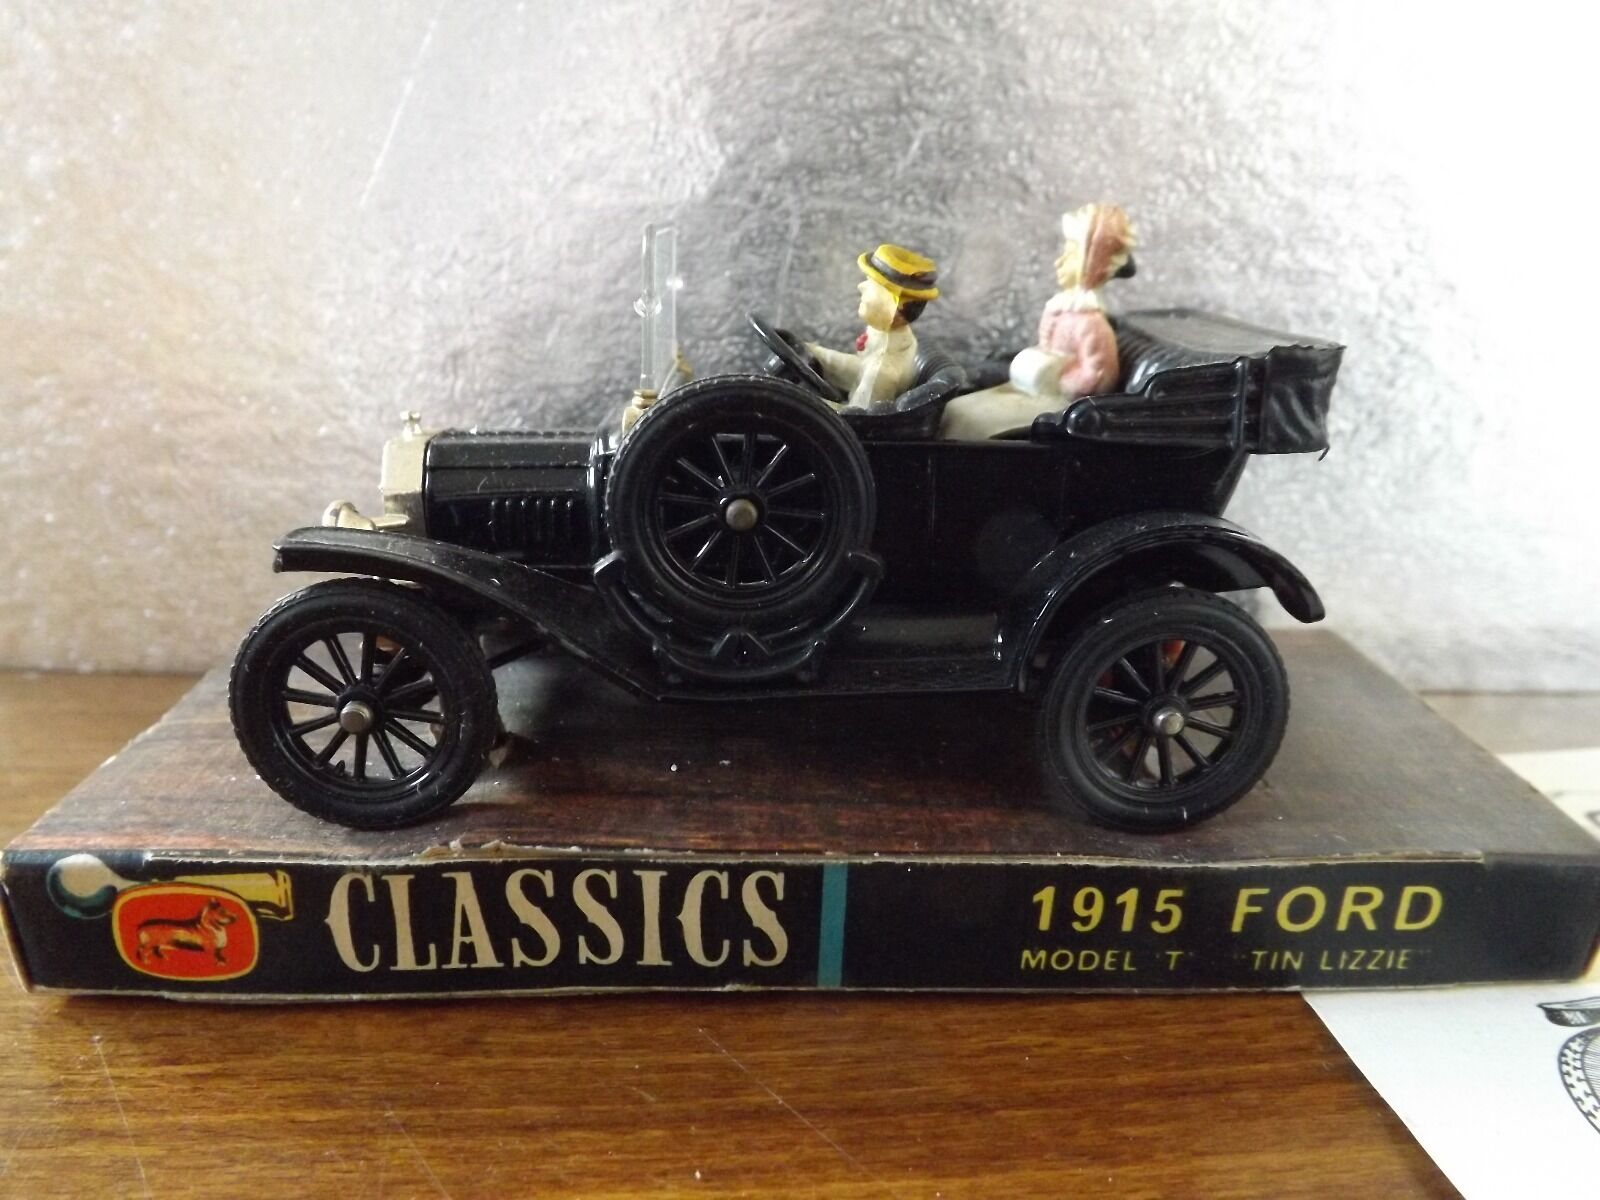 CORGI CLASSICS 1915 FORD MODEL T ( TIN LIZZIE) LIZZIE) LIZZIE) IN ORIGINAL BOX. 9dab24